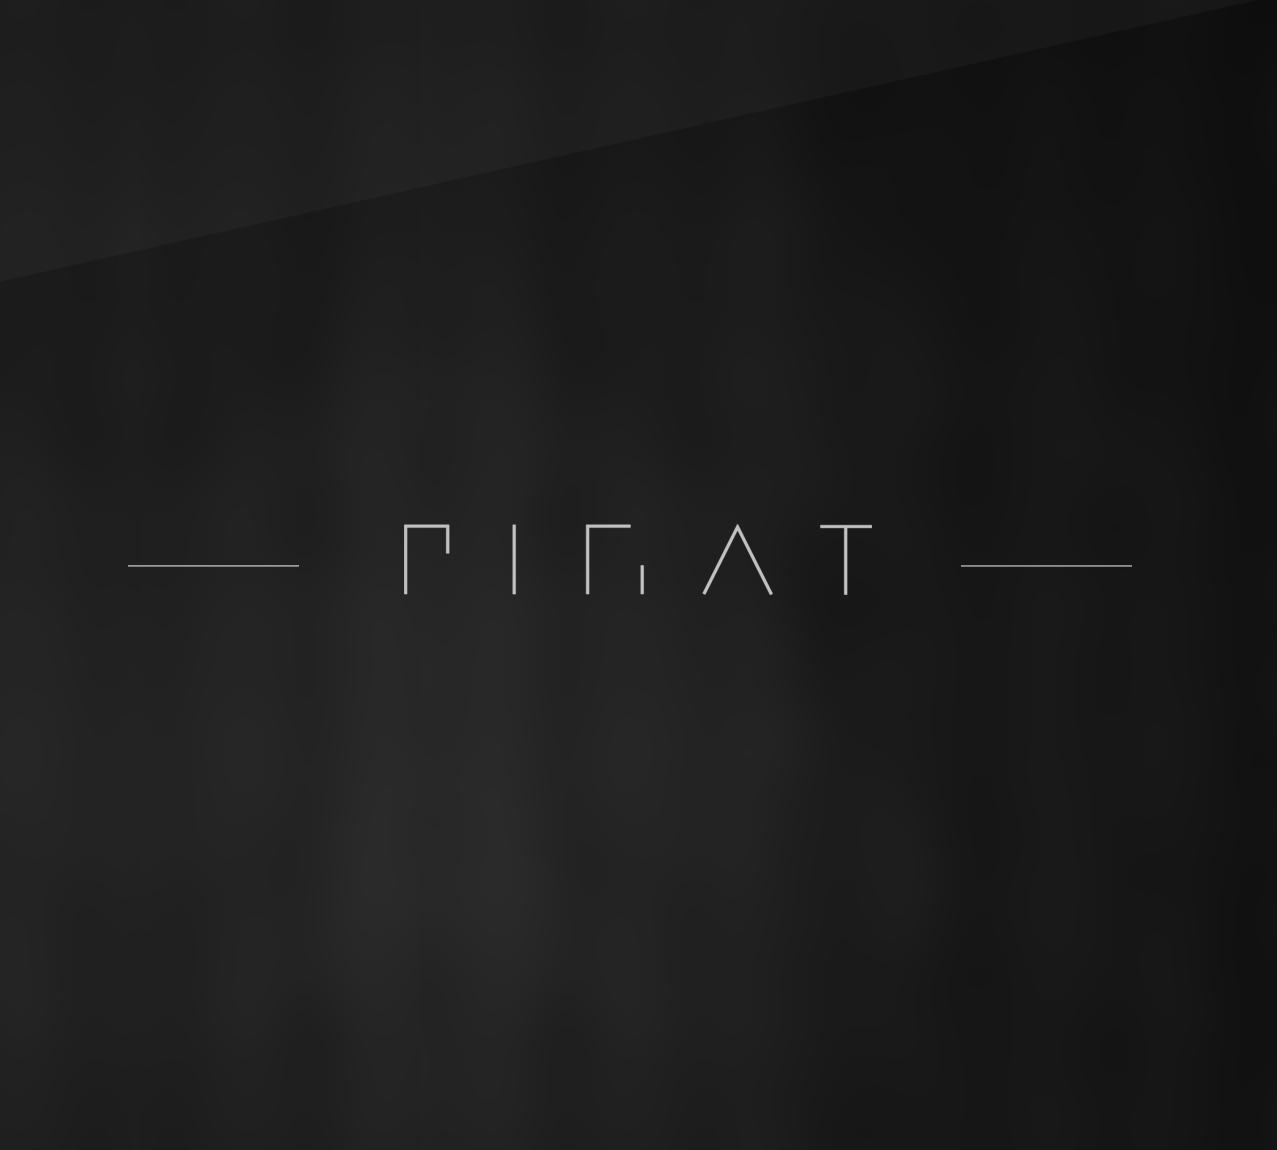 Pirat Font Design